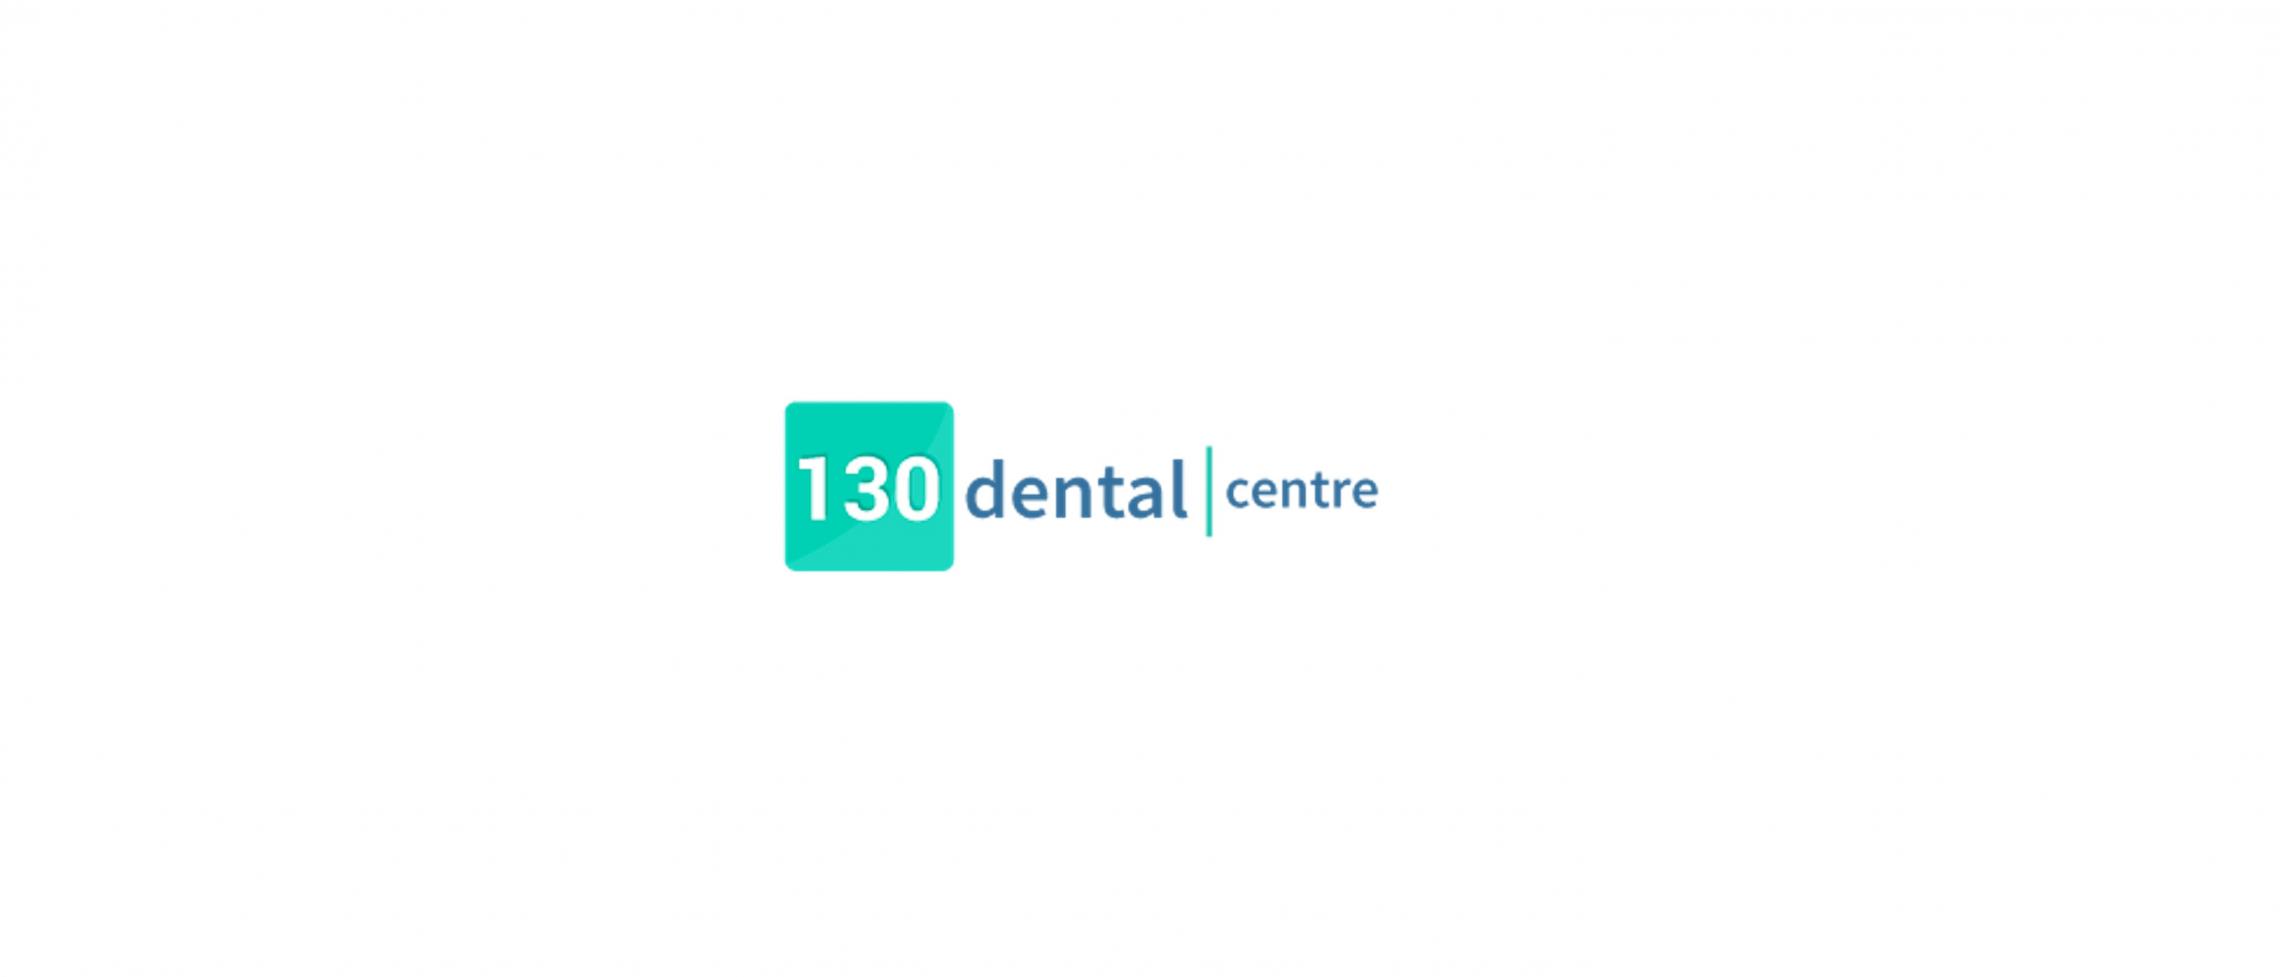 130 Dental Centre - The MiSmile Network